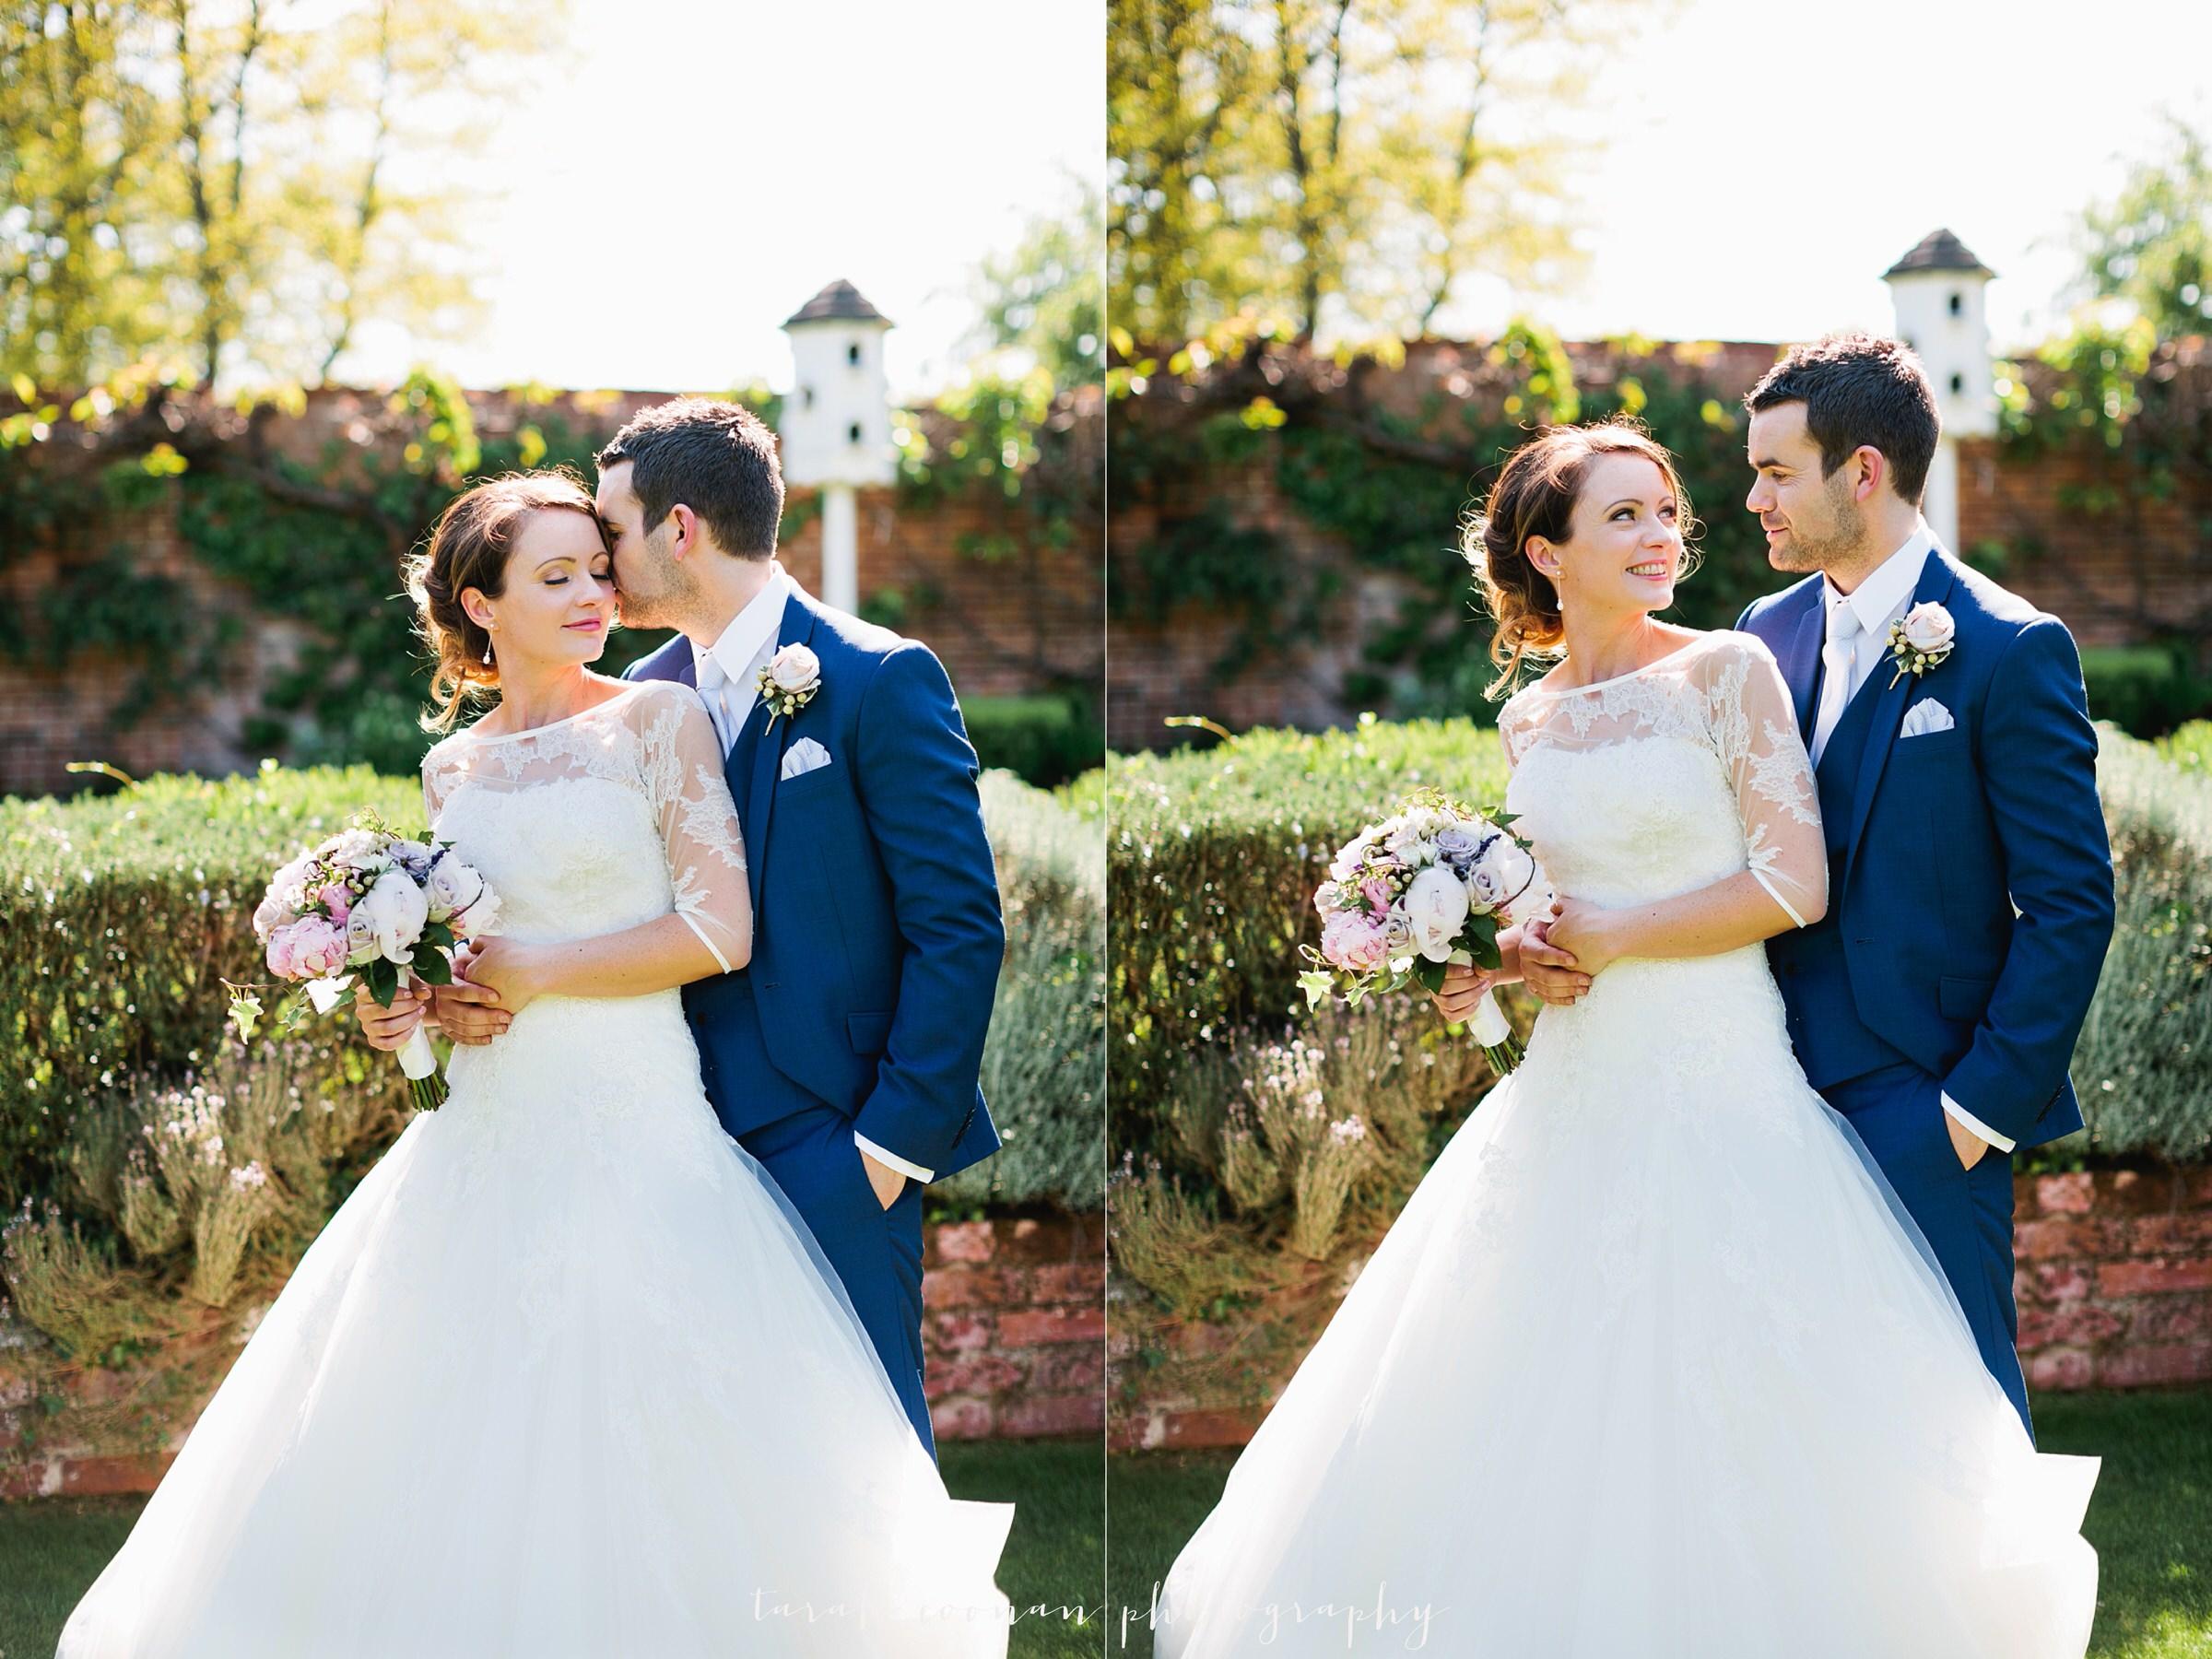 northbrook-park-wedding-photographer_061